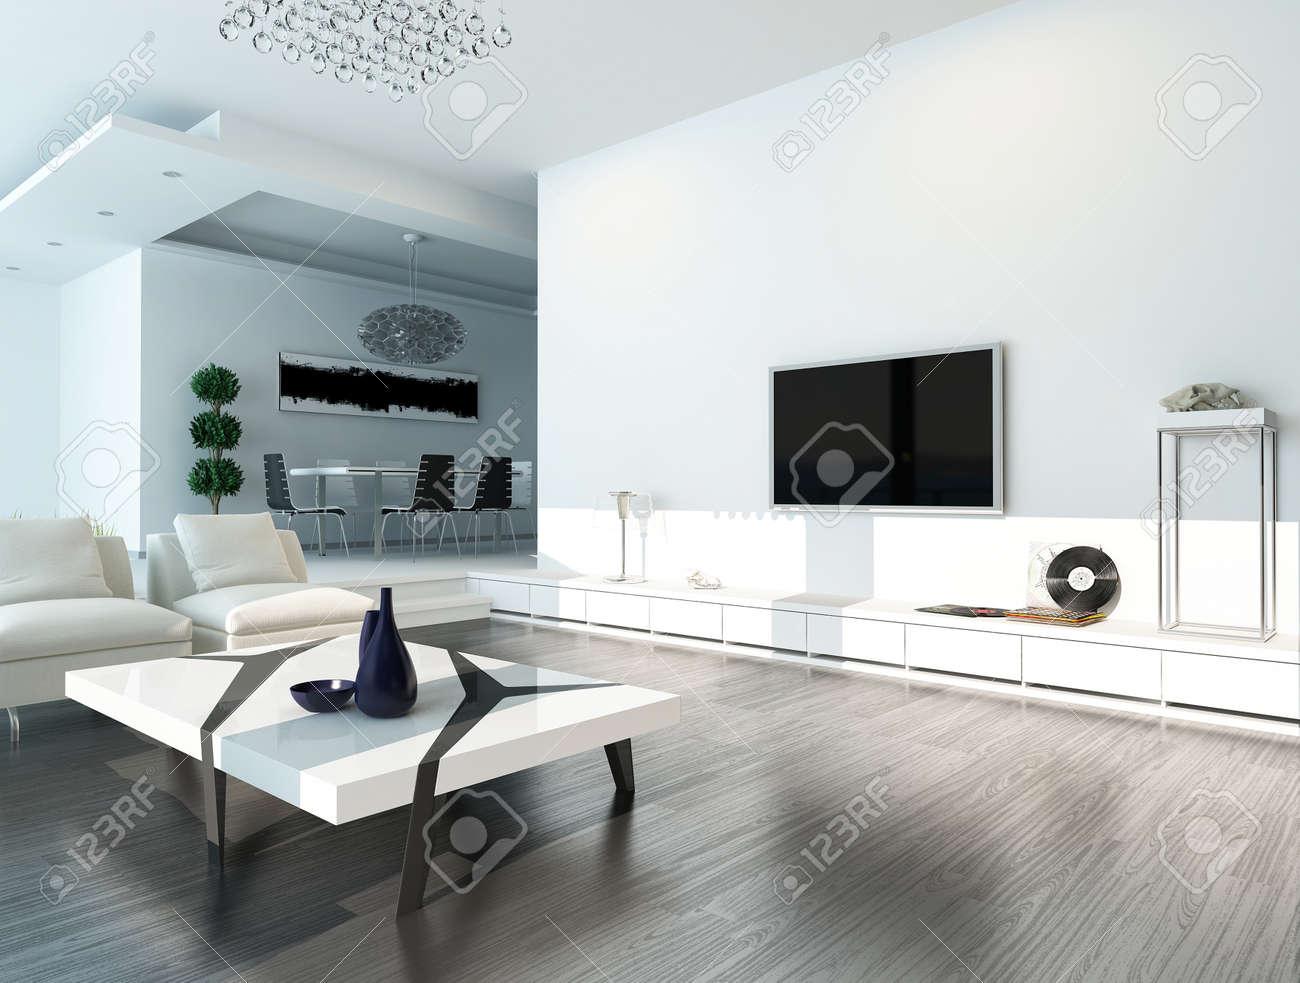 Idee Salon Noir Et Blanc Salon Id Es D Int Design Idee Deco Salon ...